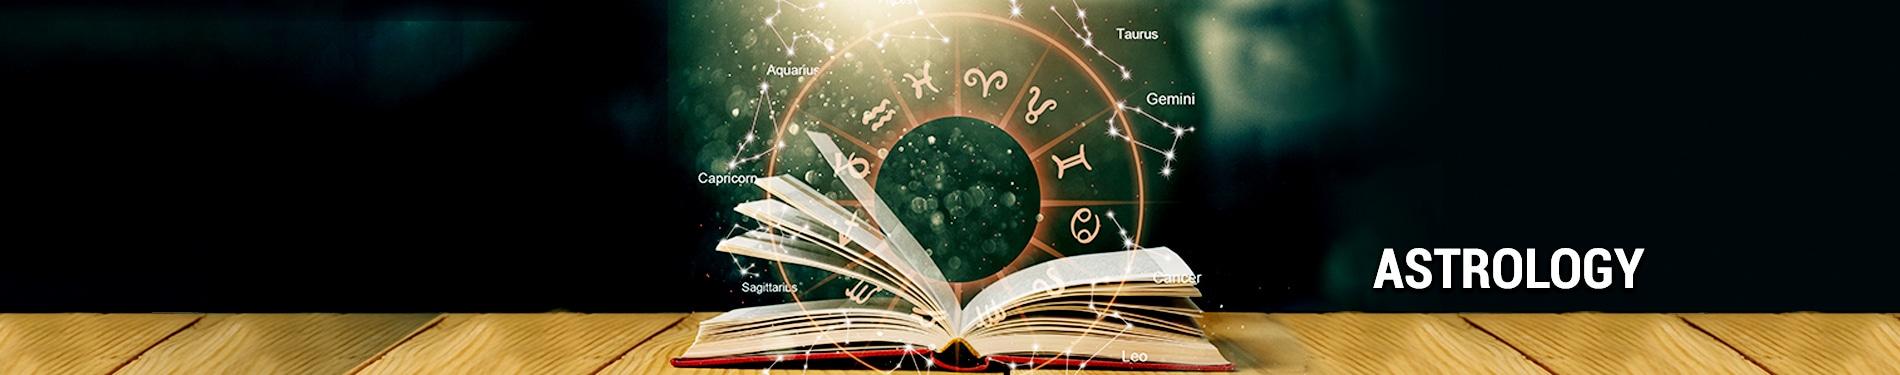 Astrology Banner